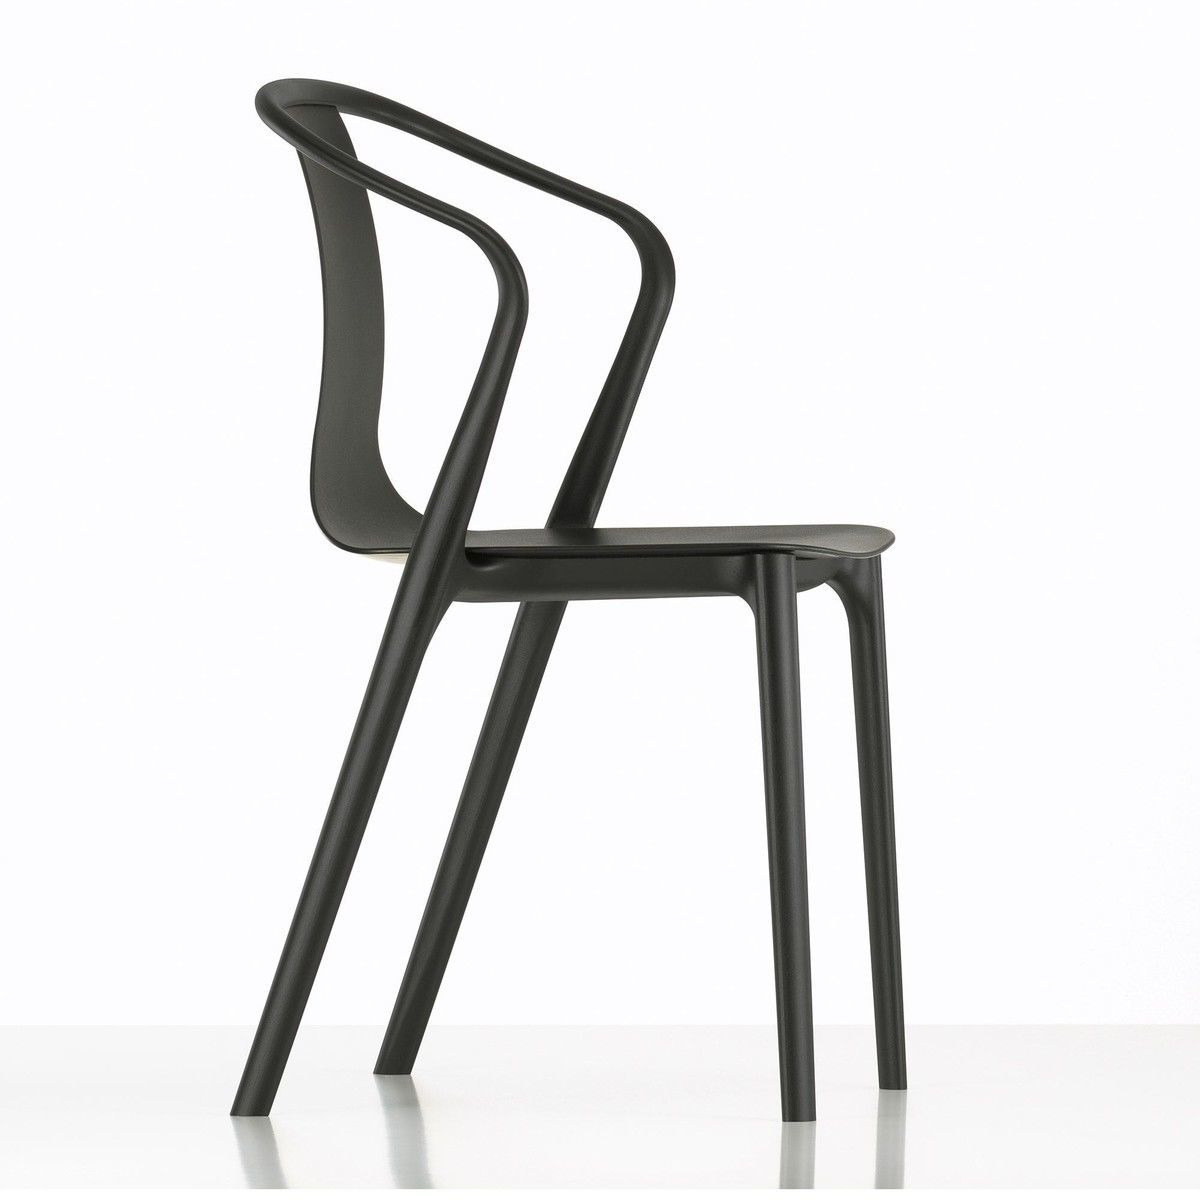 belleville armchair plastic outdoor stuhl vitra. Black Bedroom Furniture Sets. Home Design Ideas